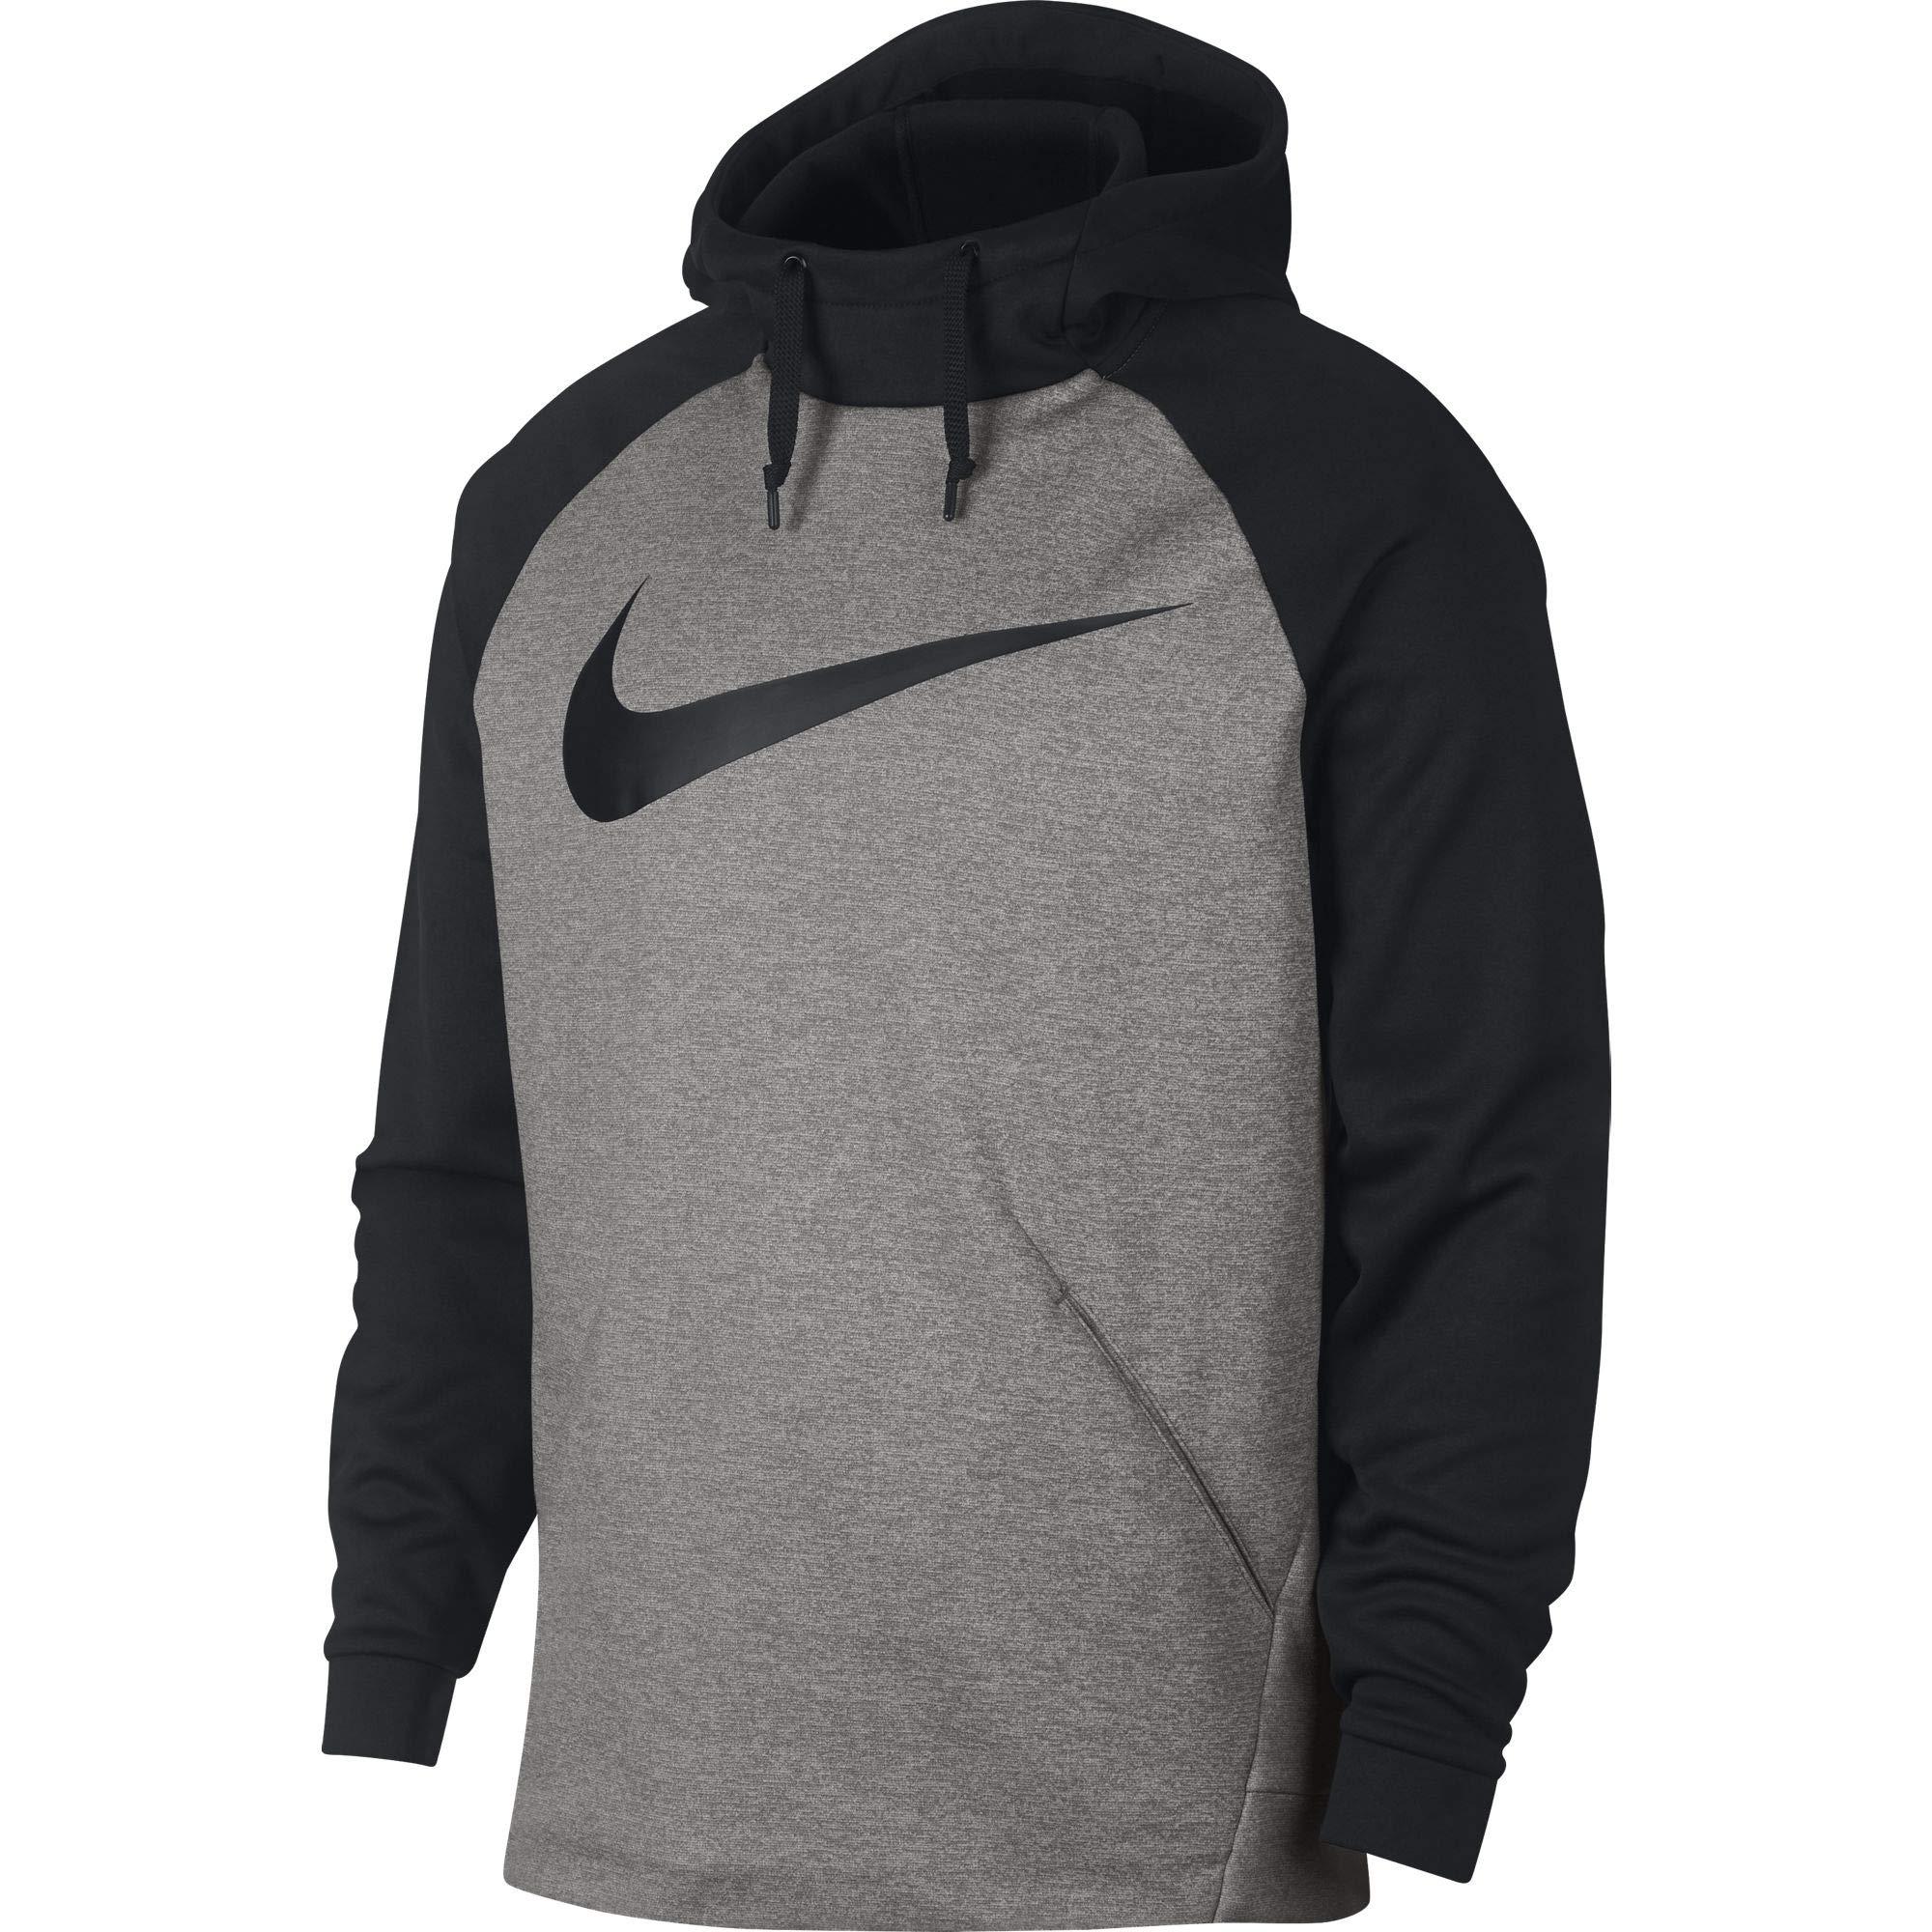 Nike Men's Therma Swoosh Training Hoodie Dark Grey Heather/Black Size Medium